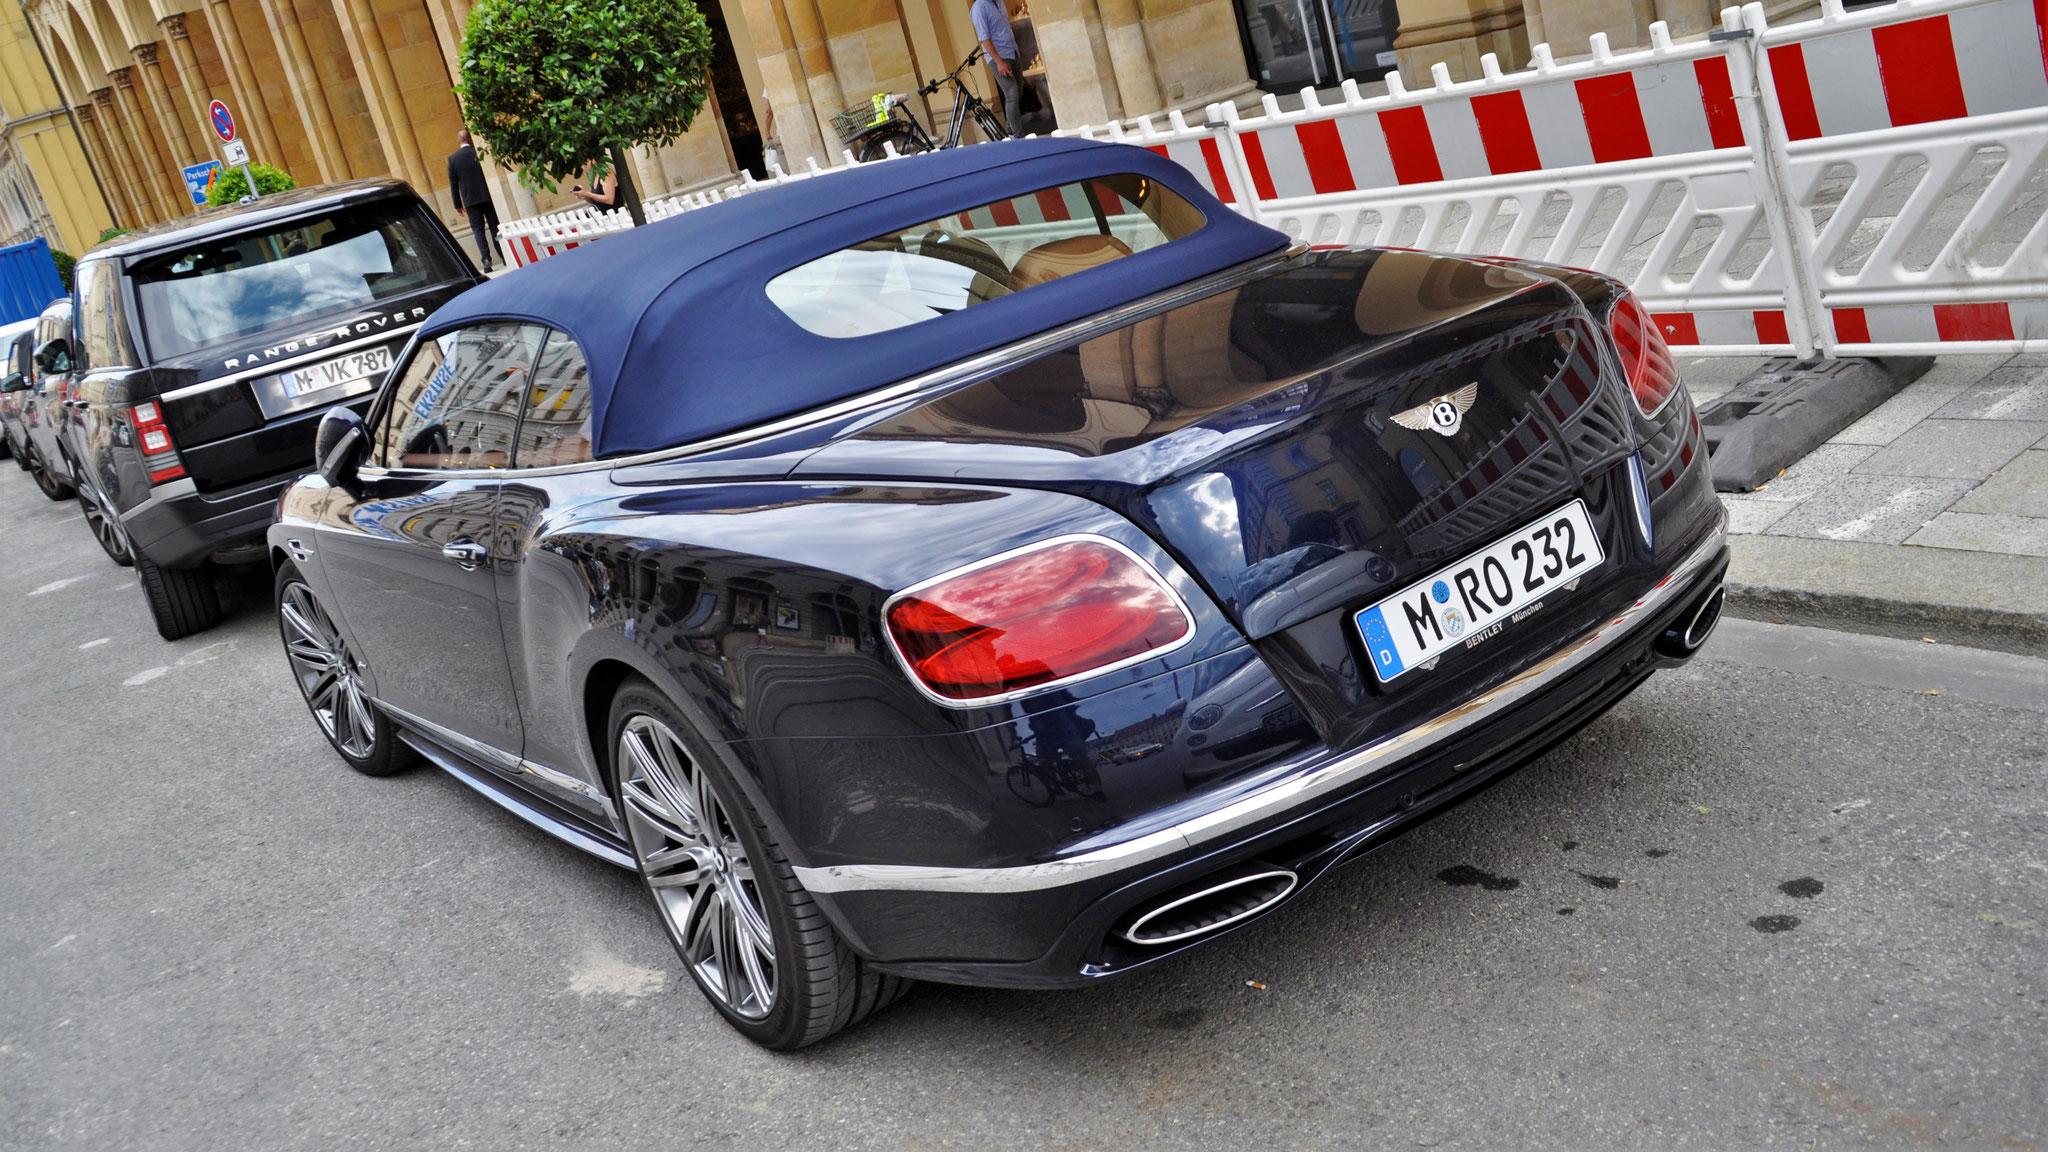 Bentley Continental GTC Speed - M-RO-232